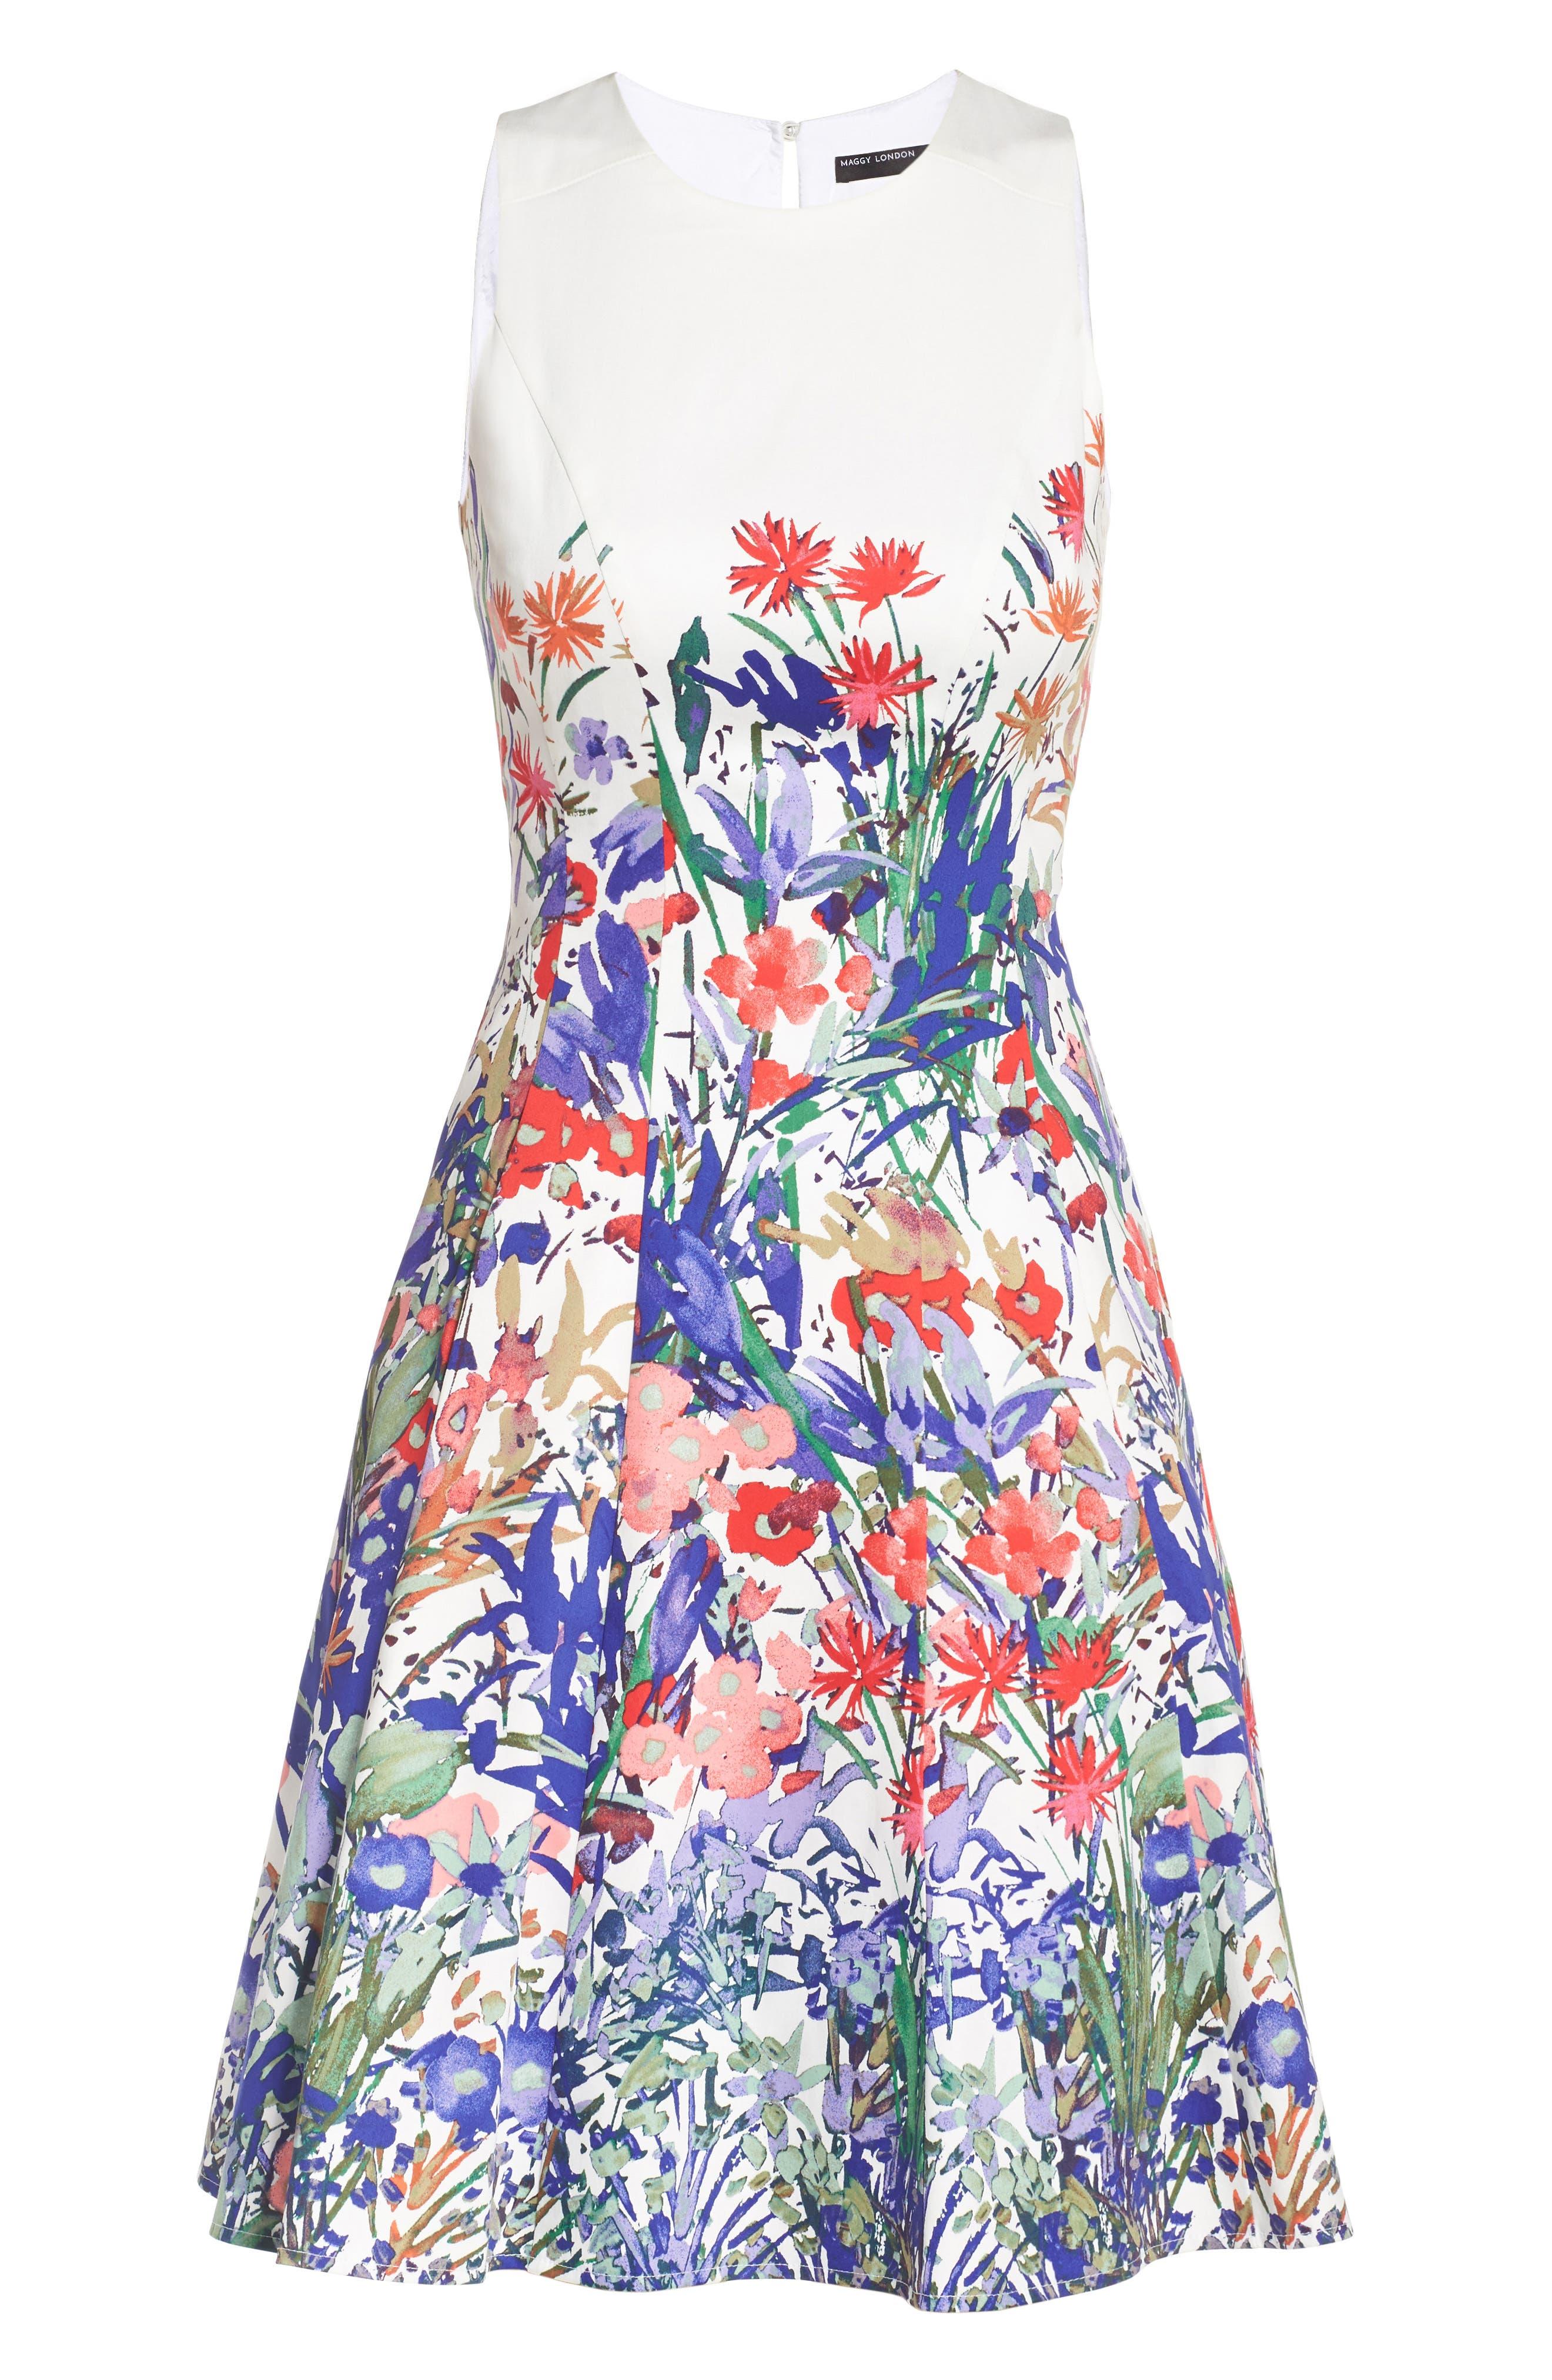 Cottage Garden Fit & Flare Dress,                             Alternate thumbnail 6, color,                             163